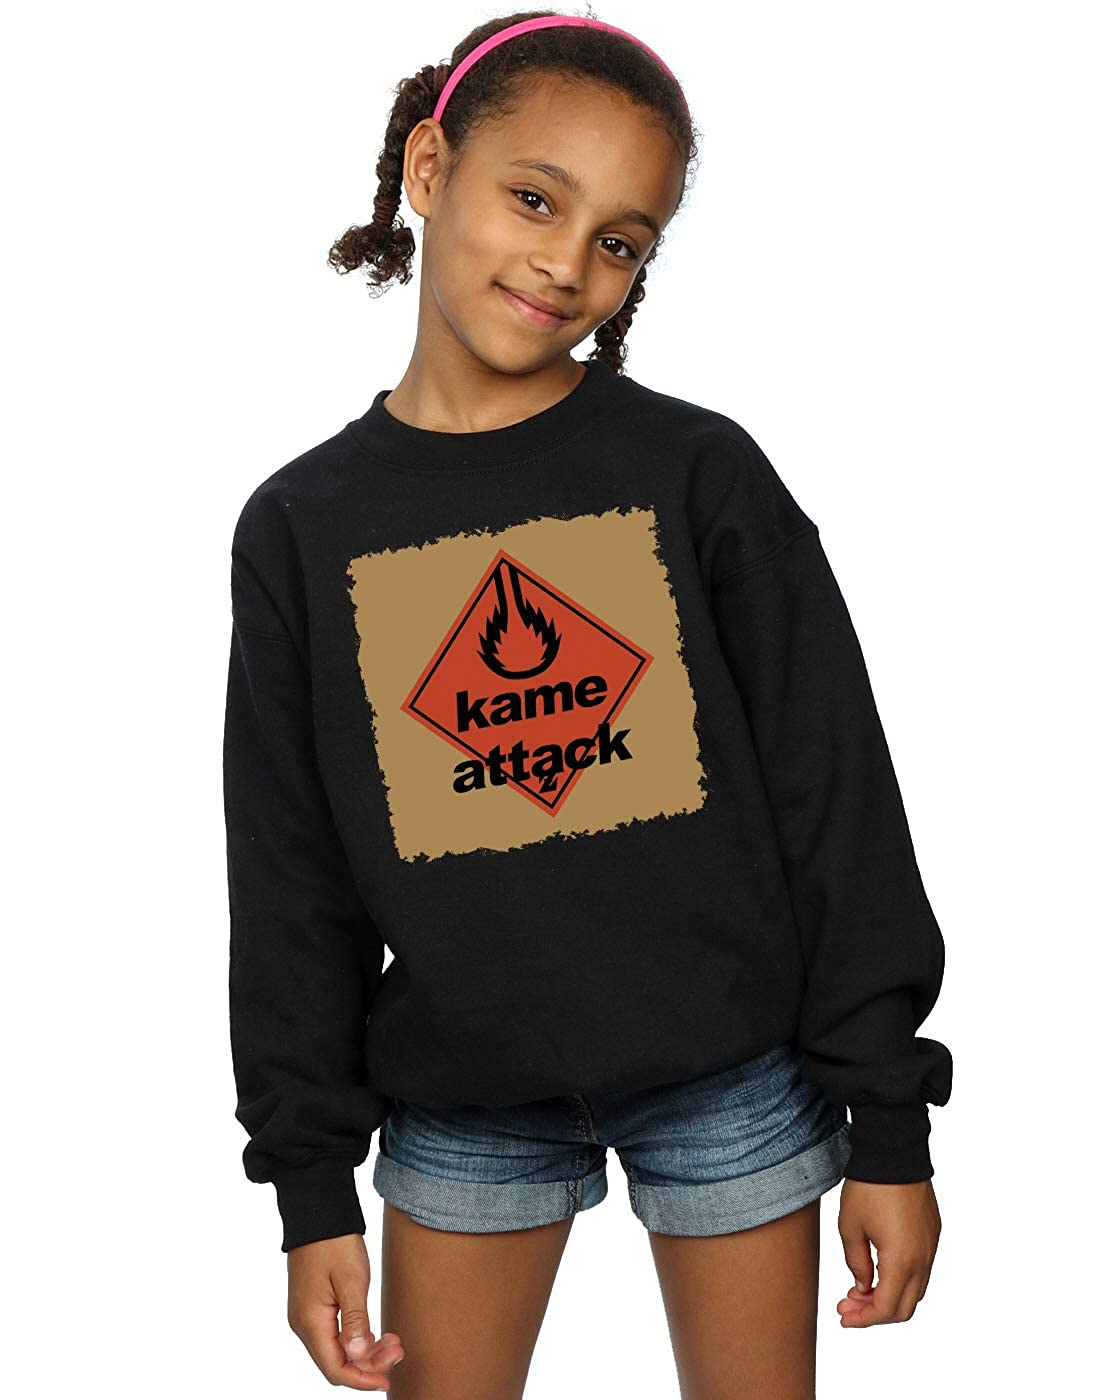 Absolute Cult Ntesign Girls Kame Attack Sweatshirt